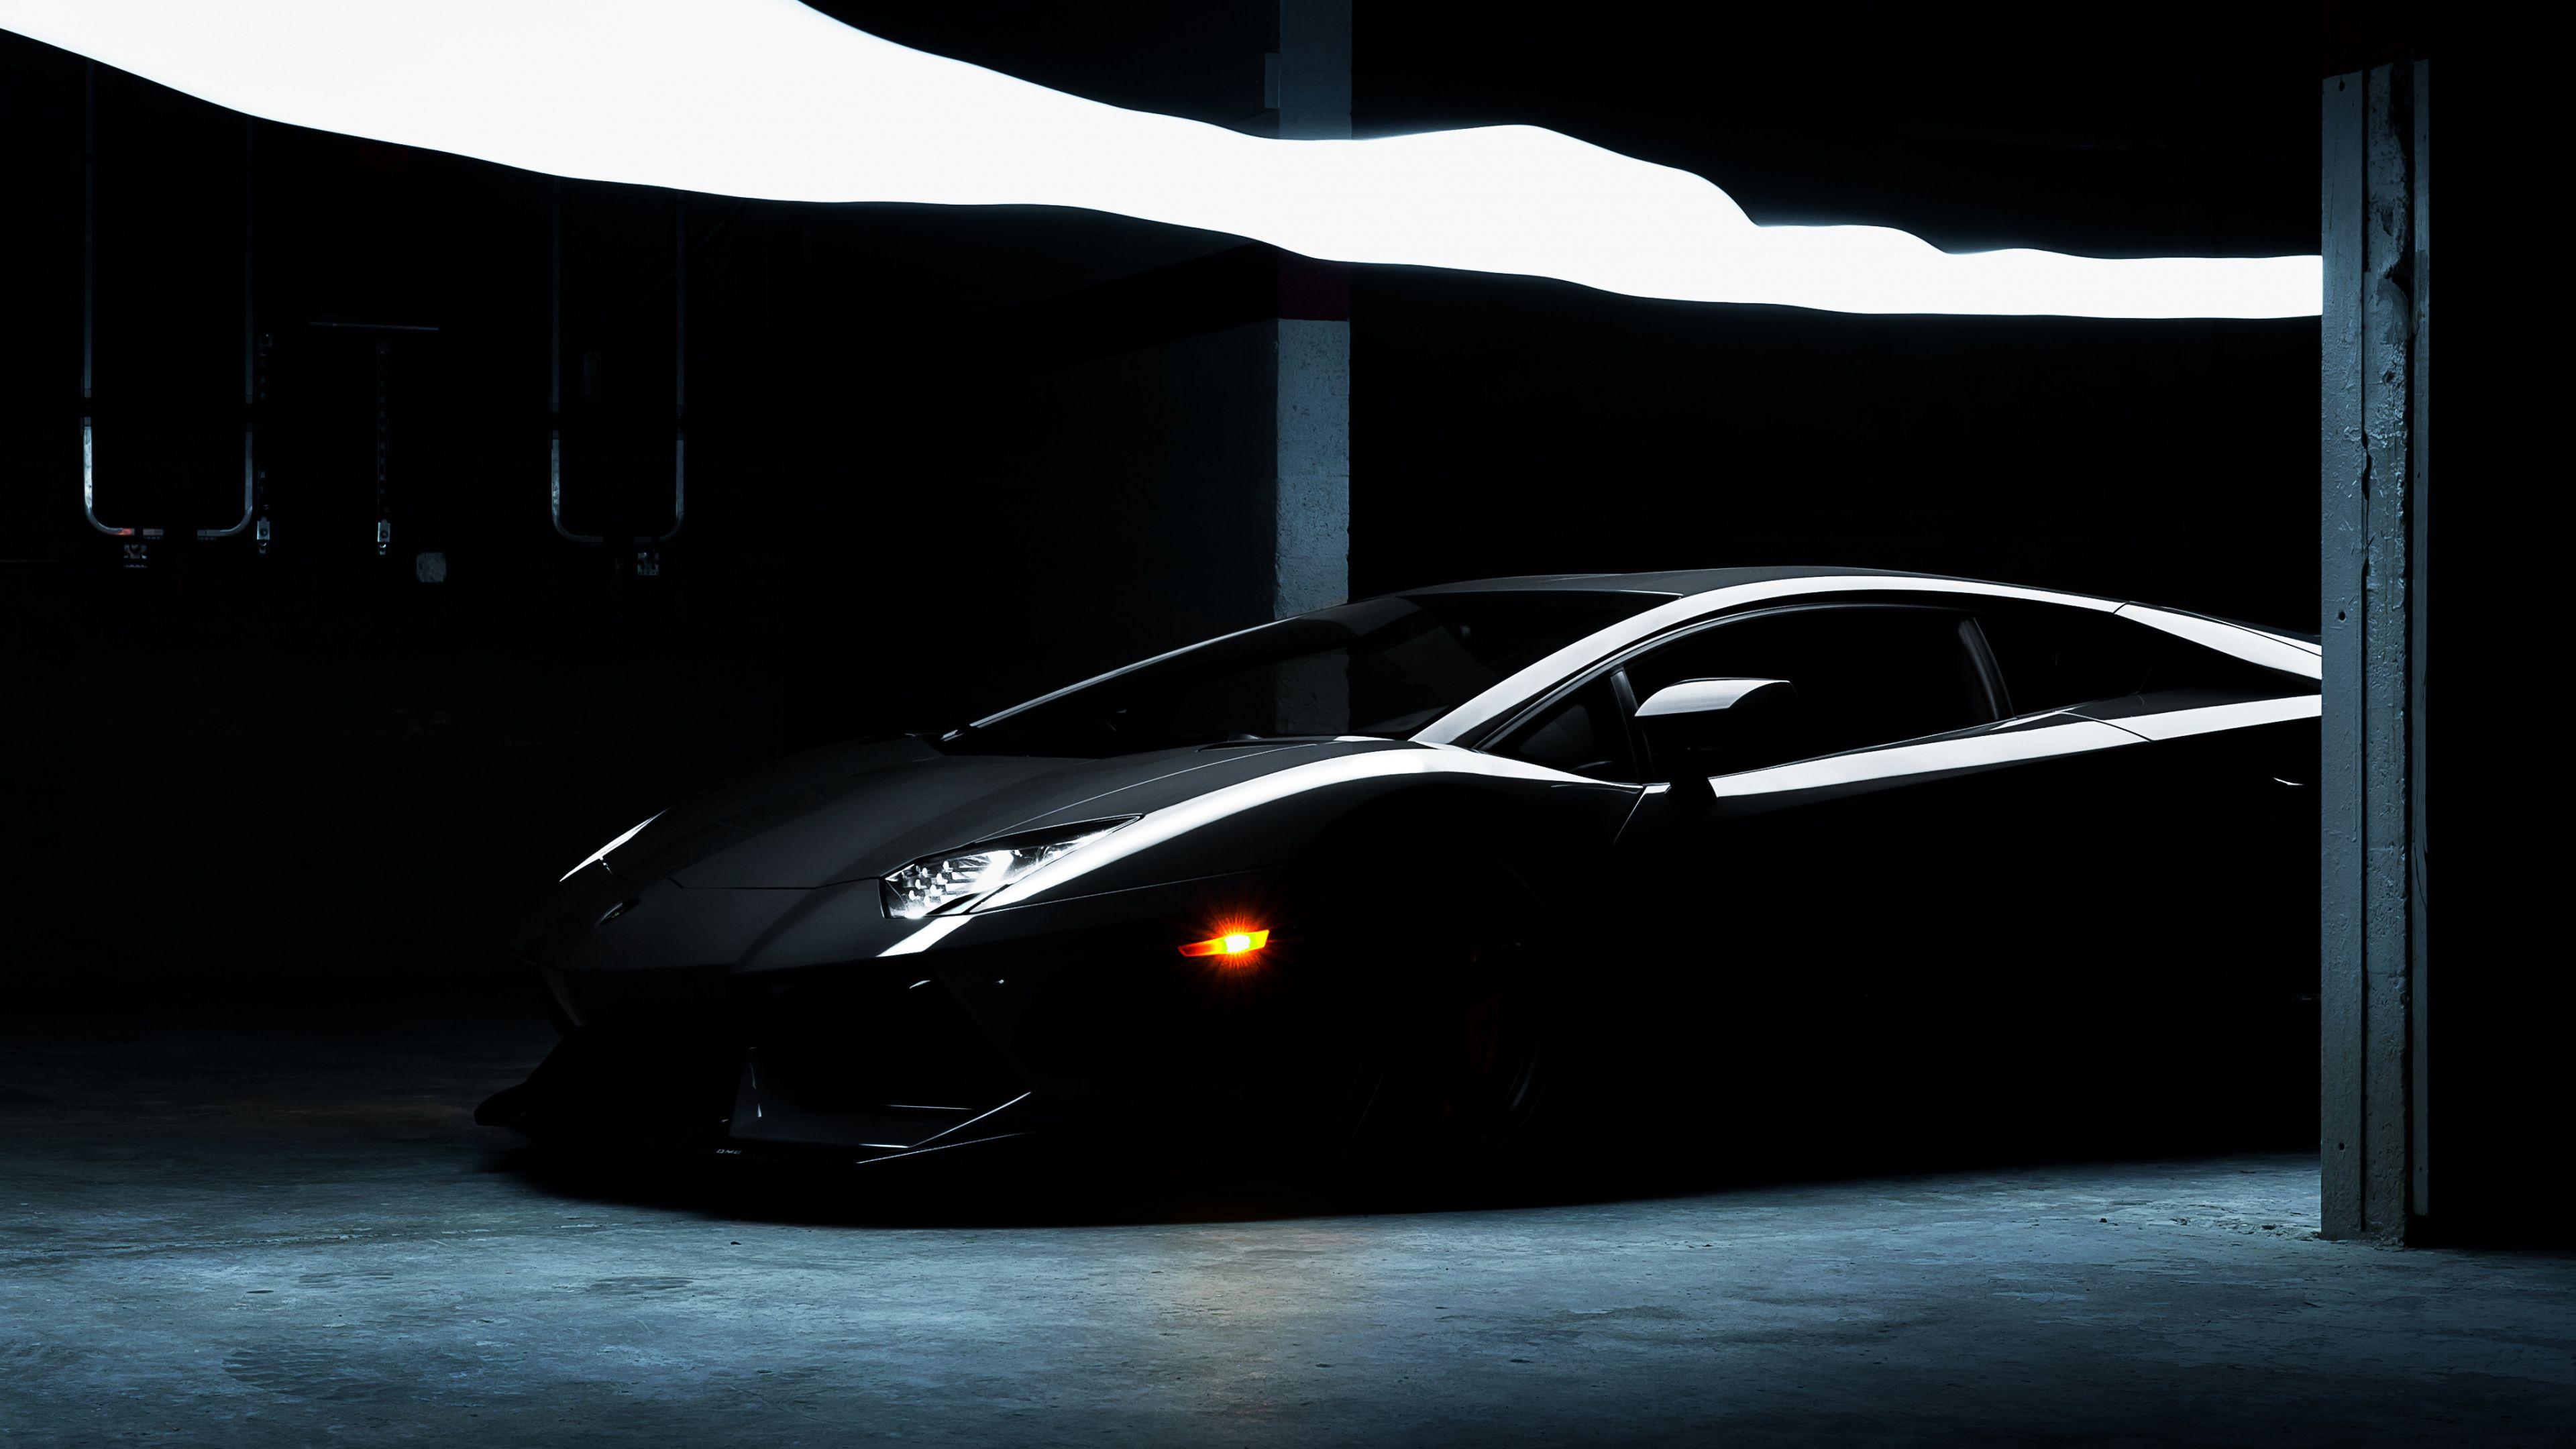 Supercar Wallpapers Full Hd Free Download Supercars Wallpaper Super Cars Lamborghini Aventador